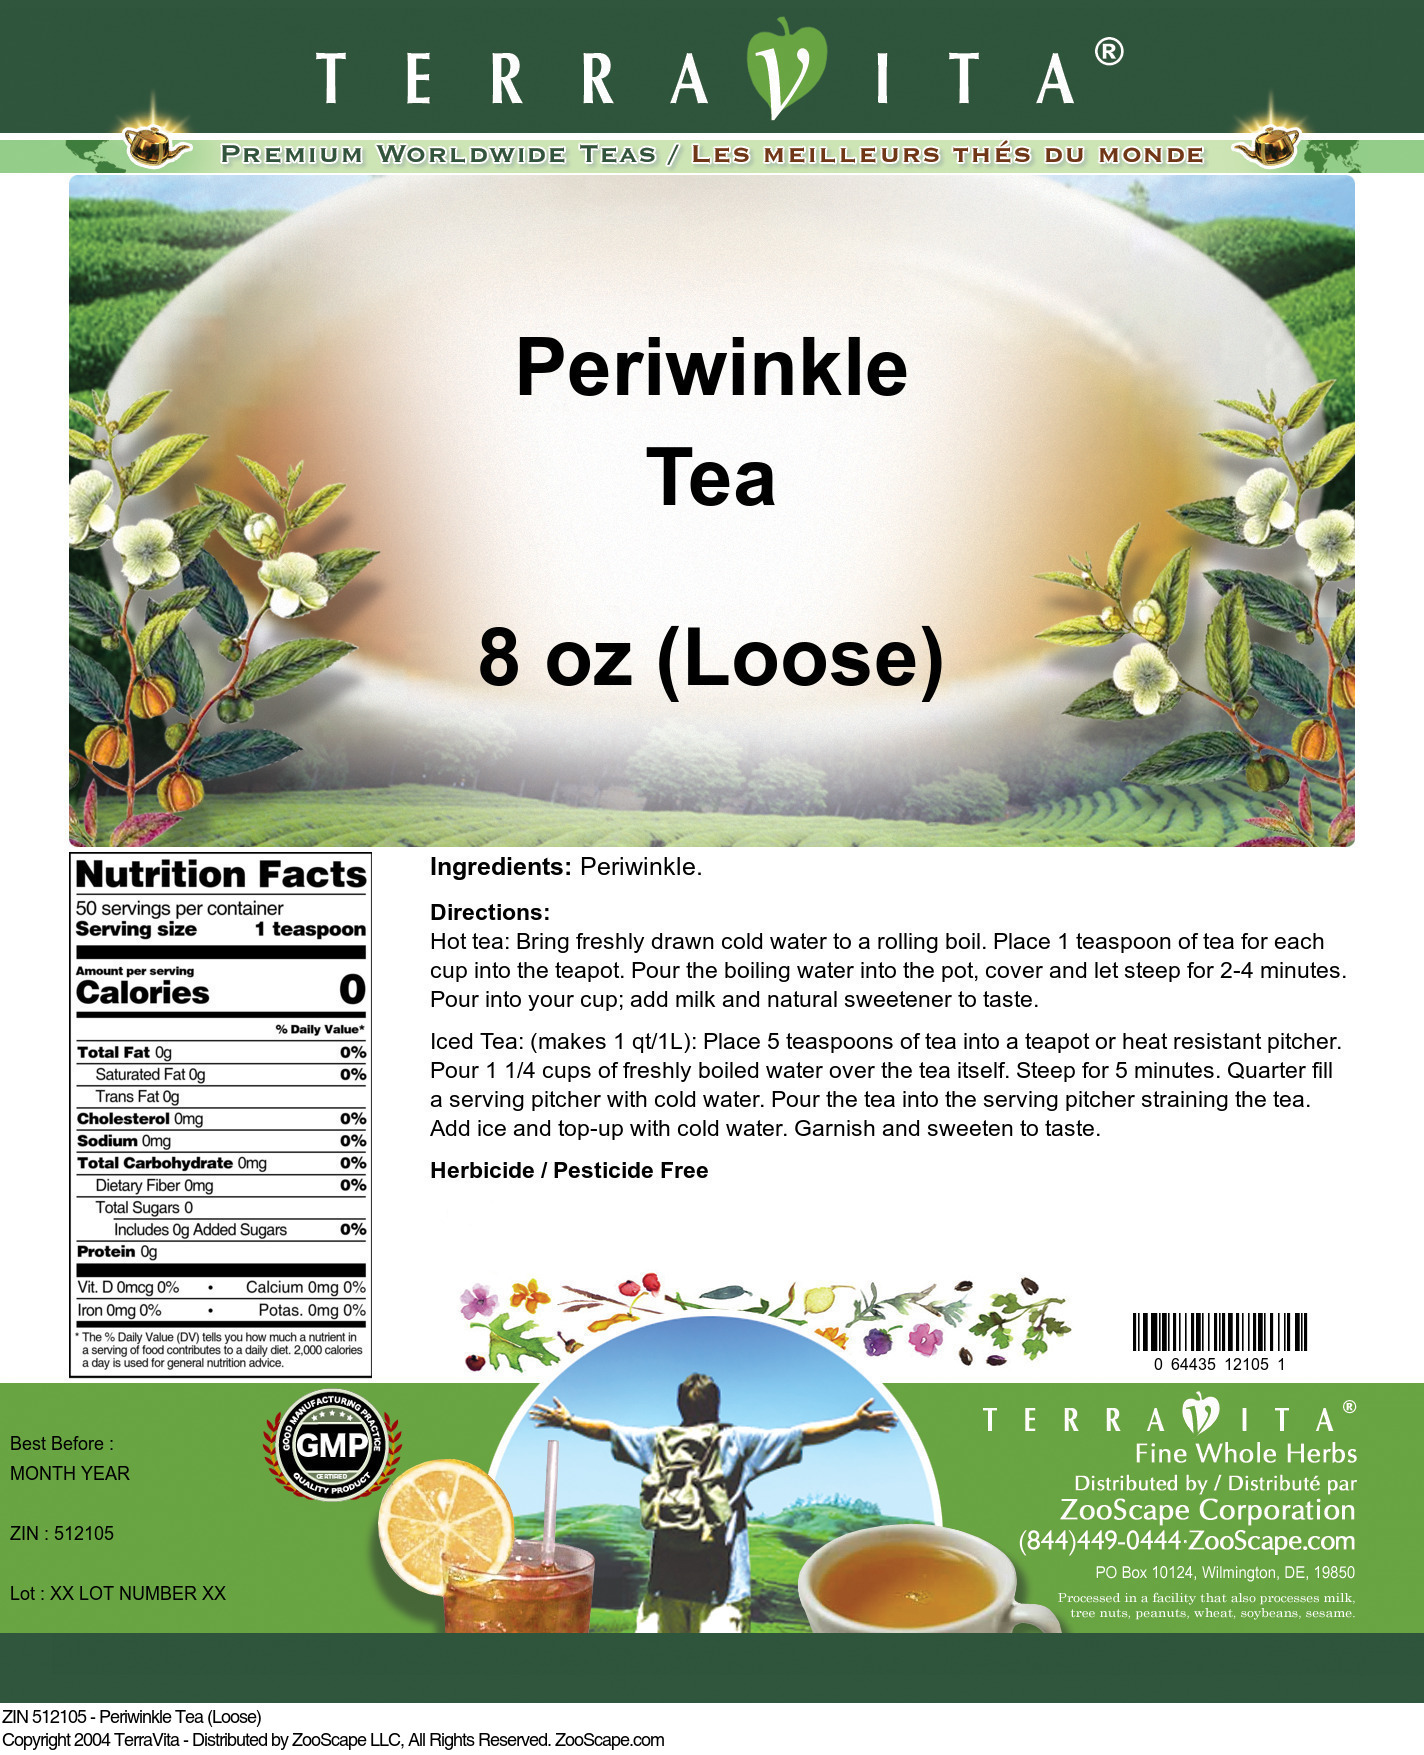 Periwinkle Tea (Loose)